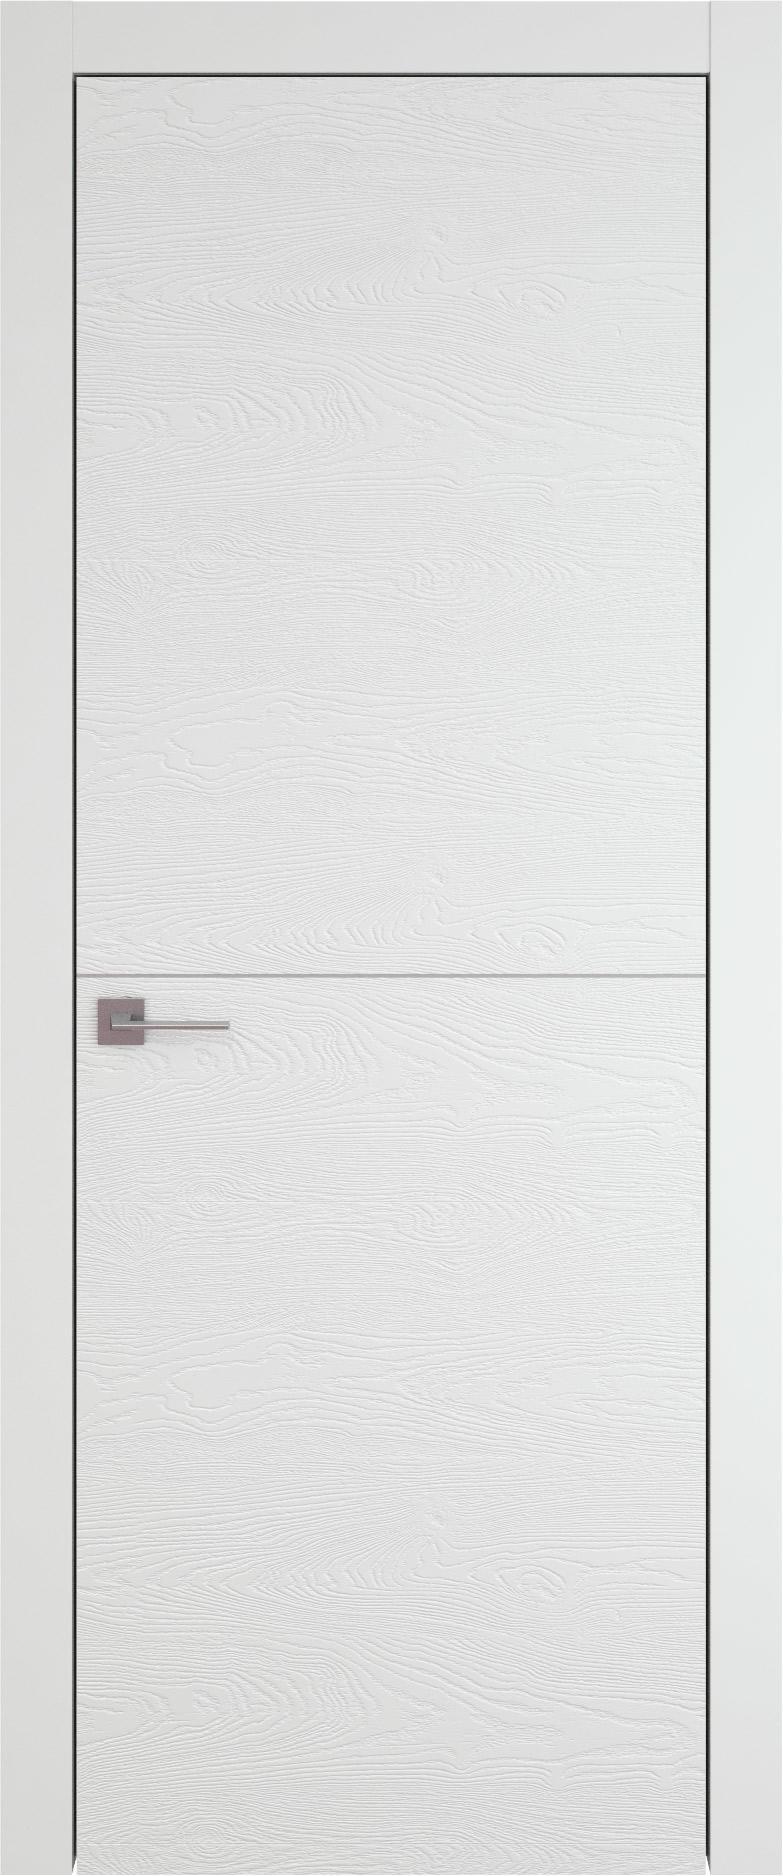 Tivoli Б-3 цвет - Белая эмаль по шпону (RAL 9003) Без стекла (ДГ)